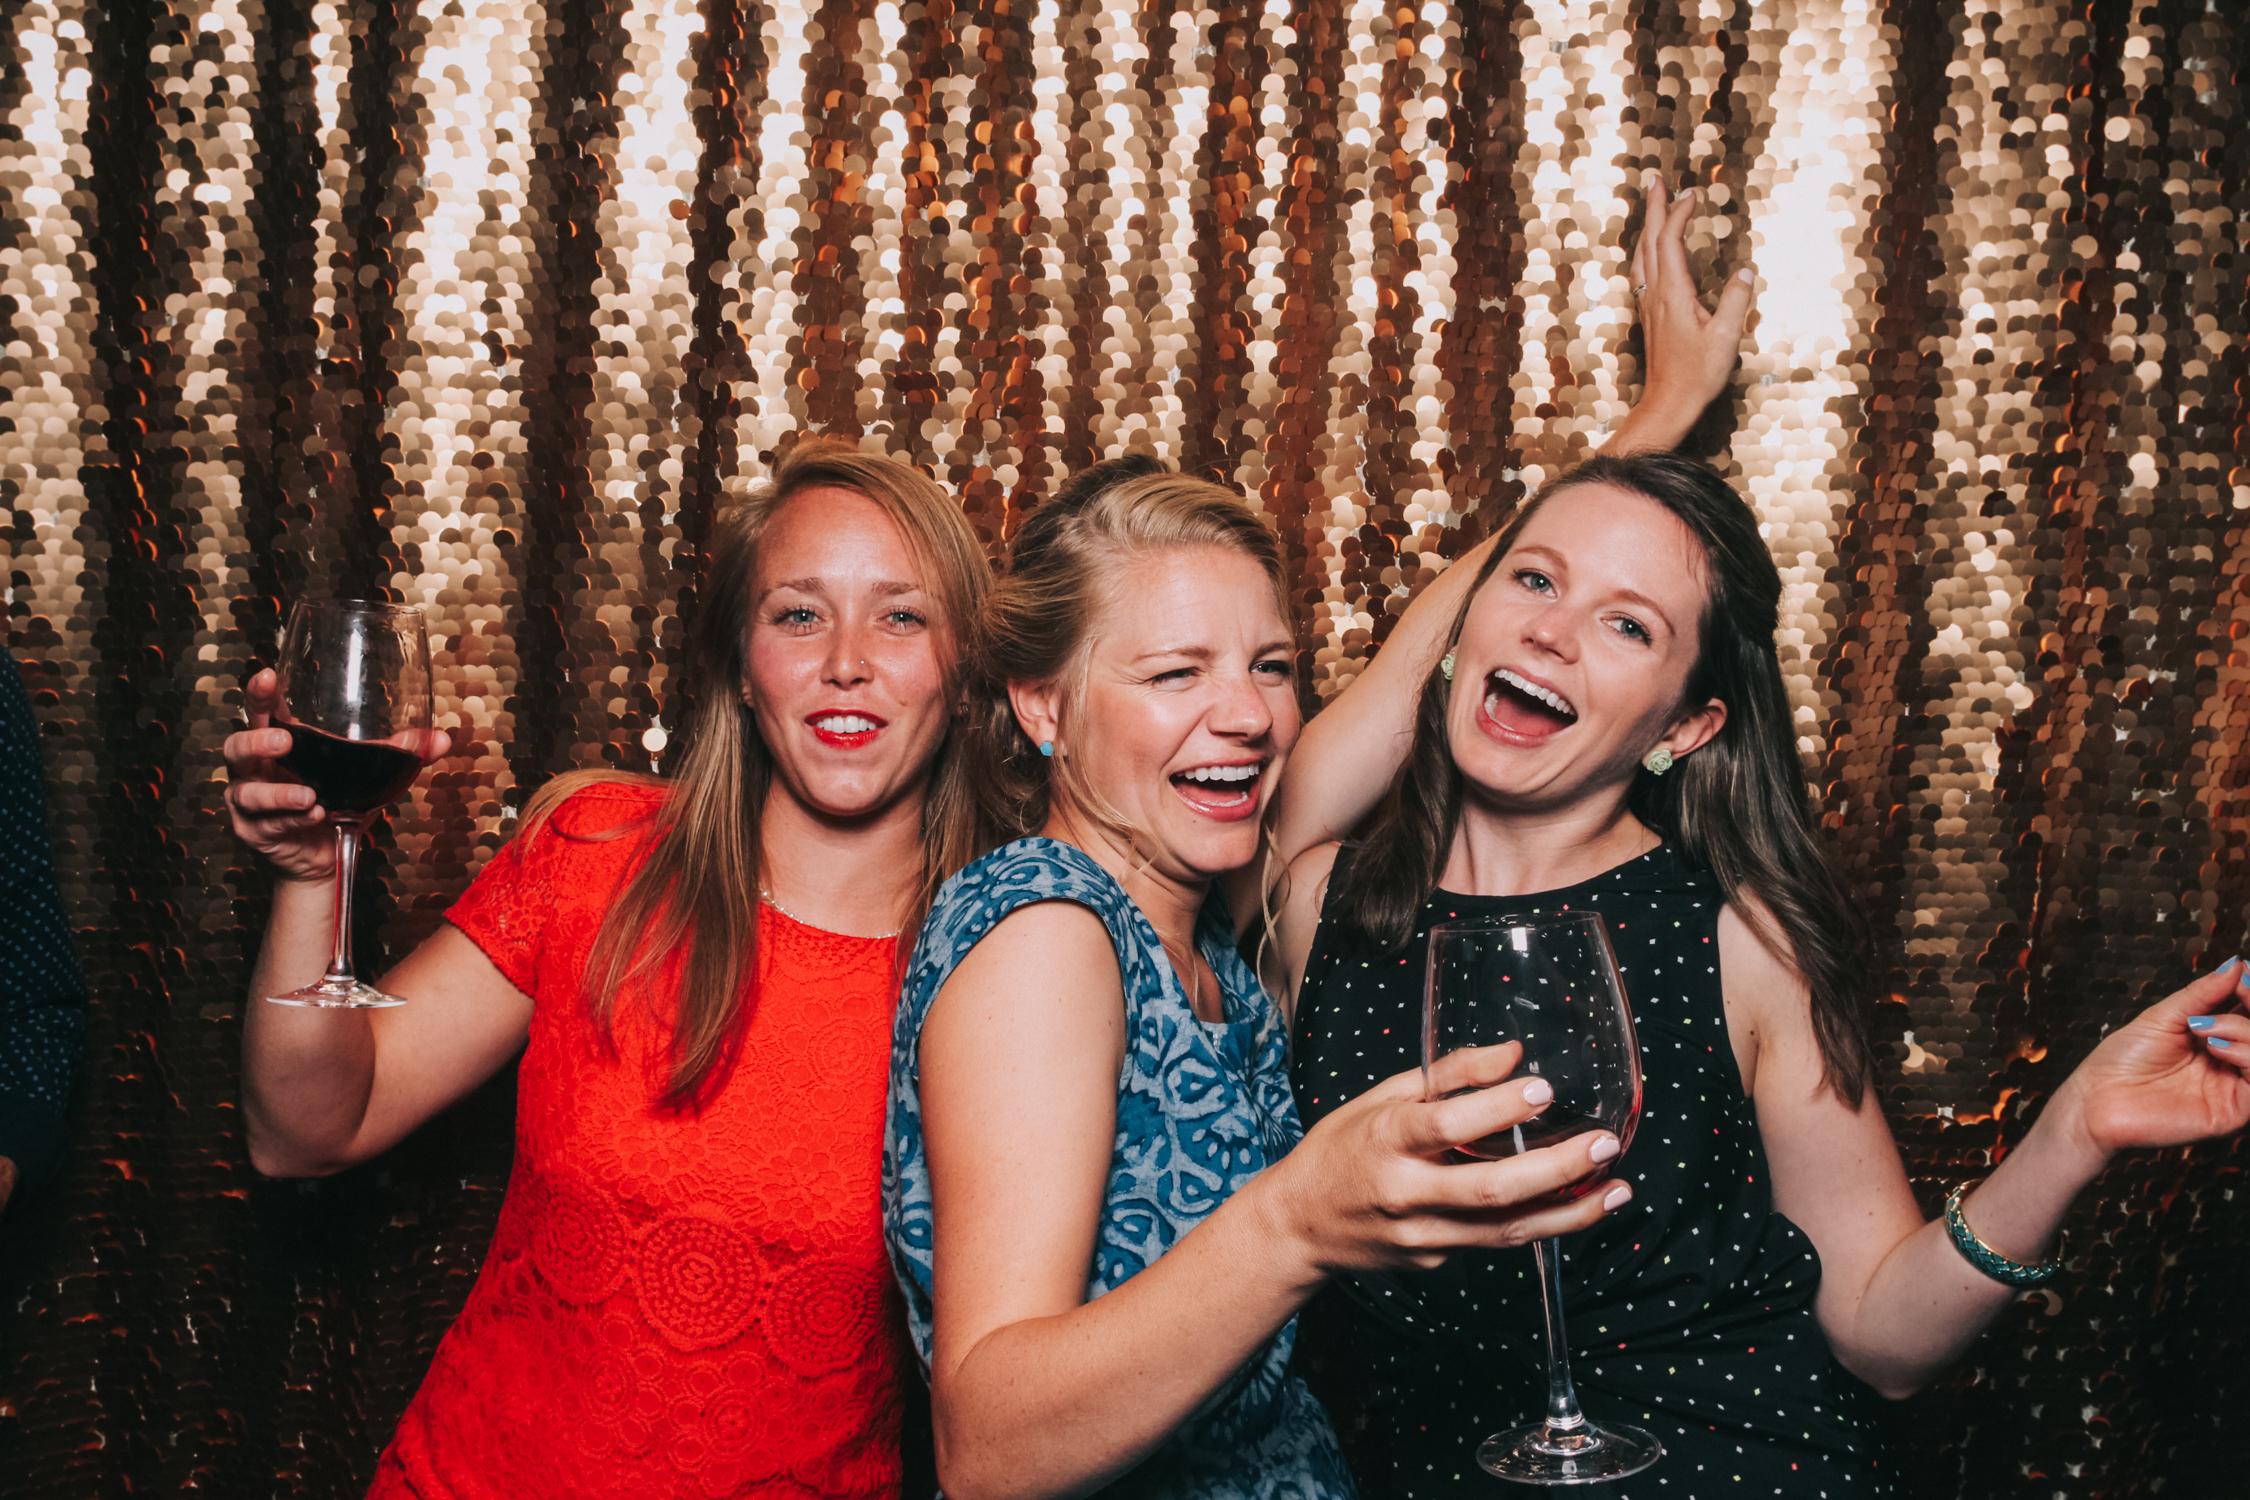 baltimore rusty scupper wedding photo booth-27.jpg